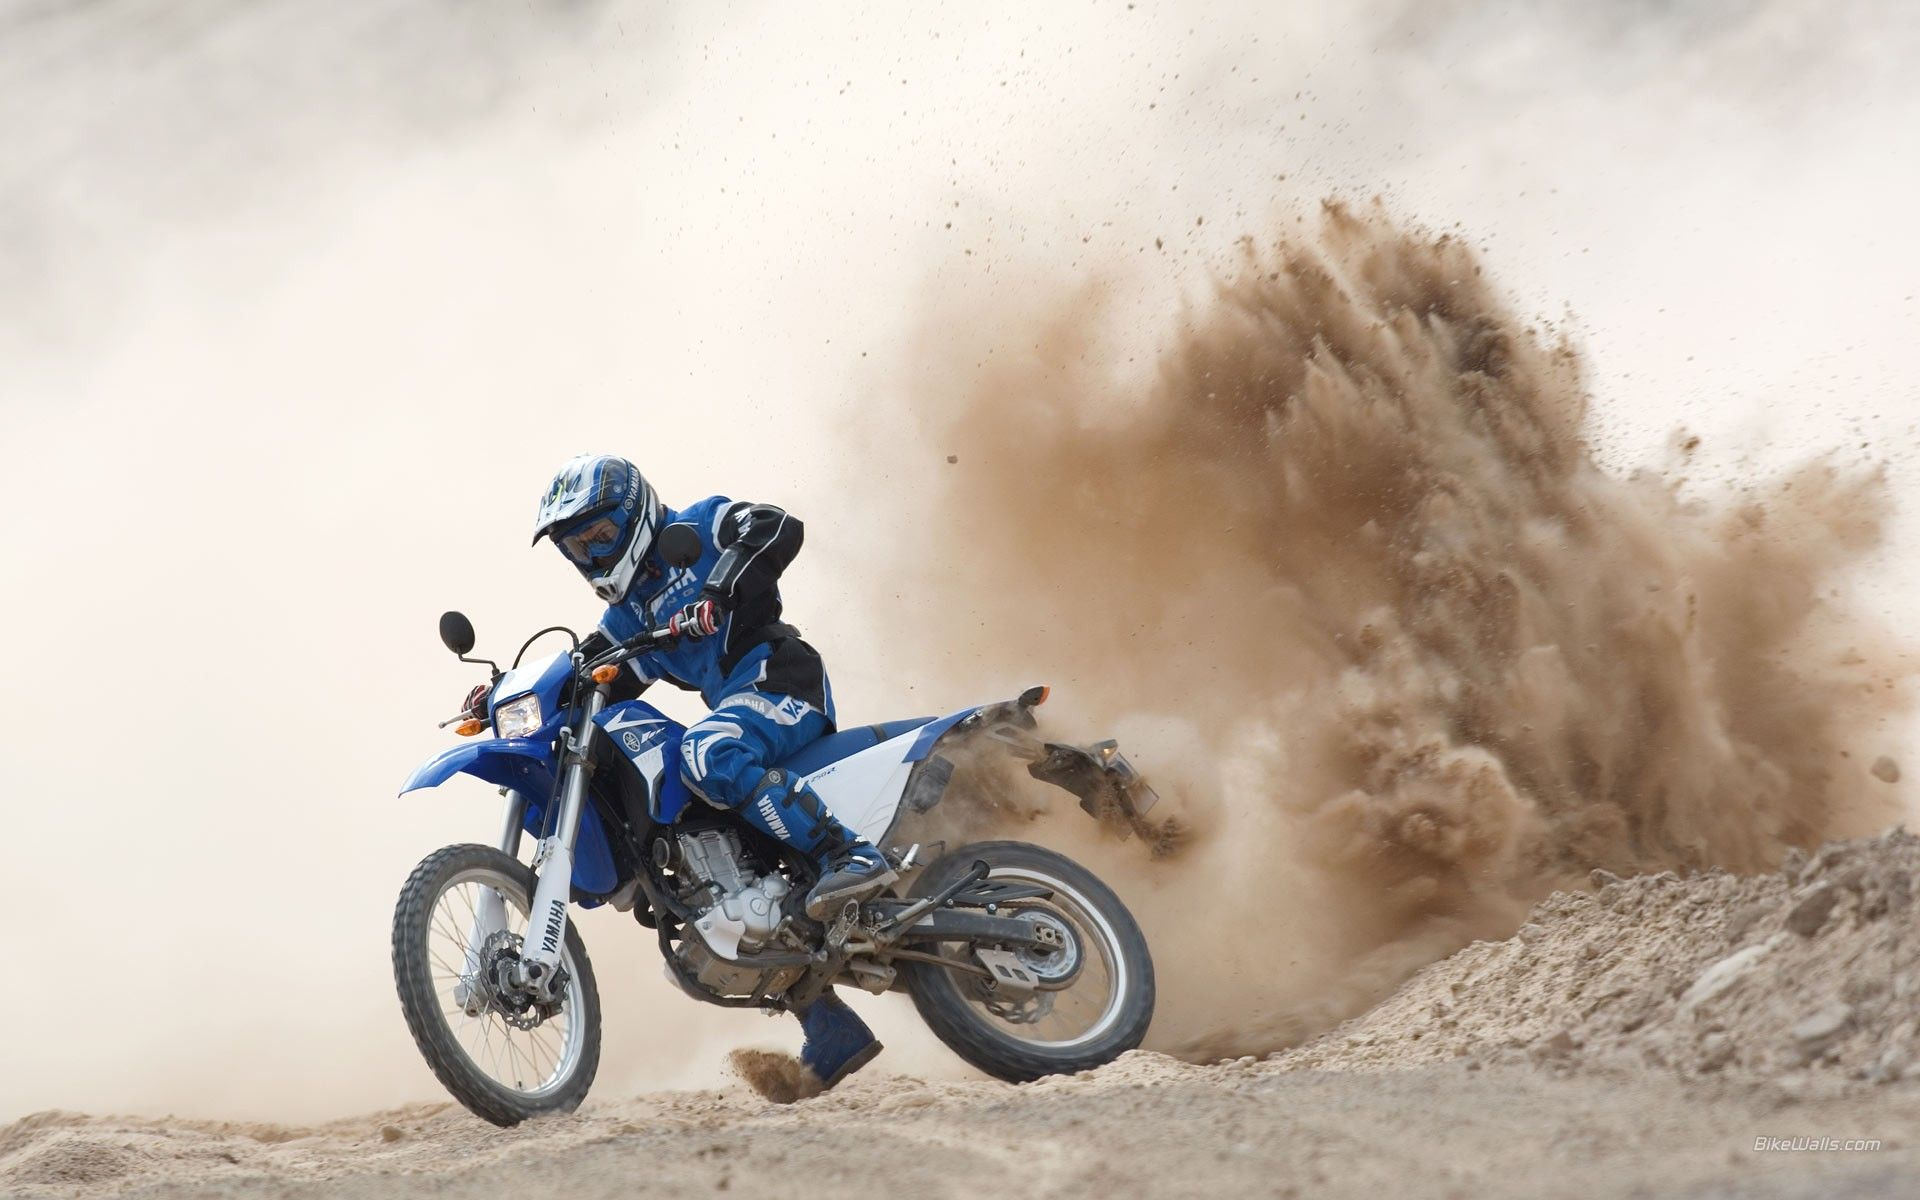 yamaha motocross wallpaper hd di 2020 Motocross